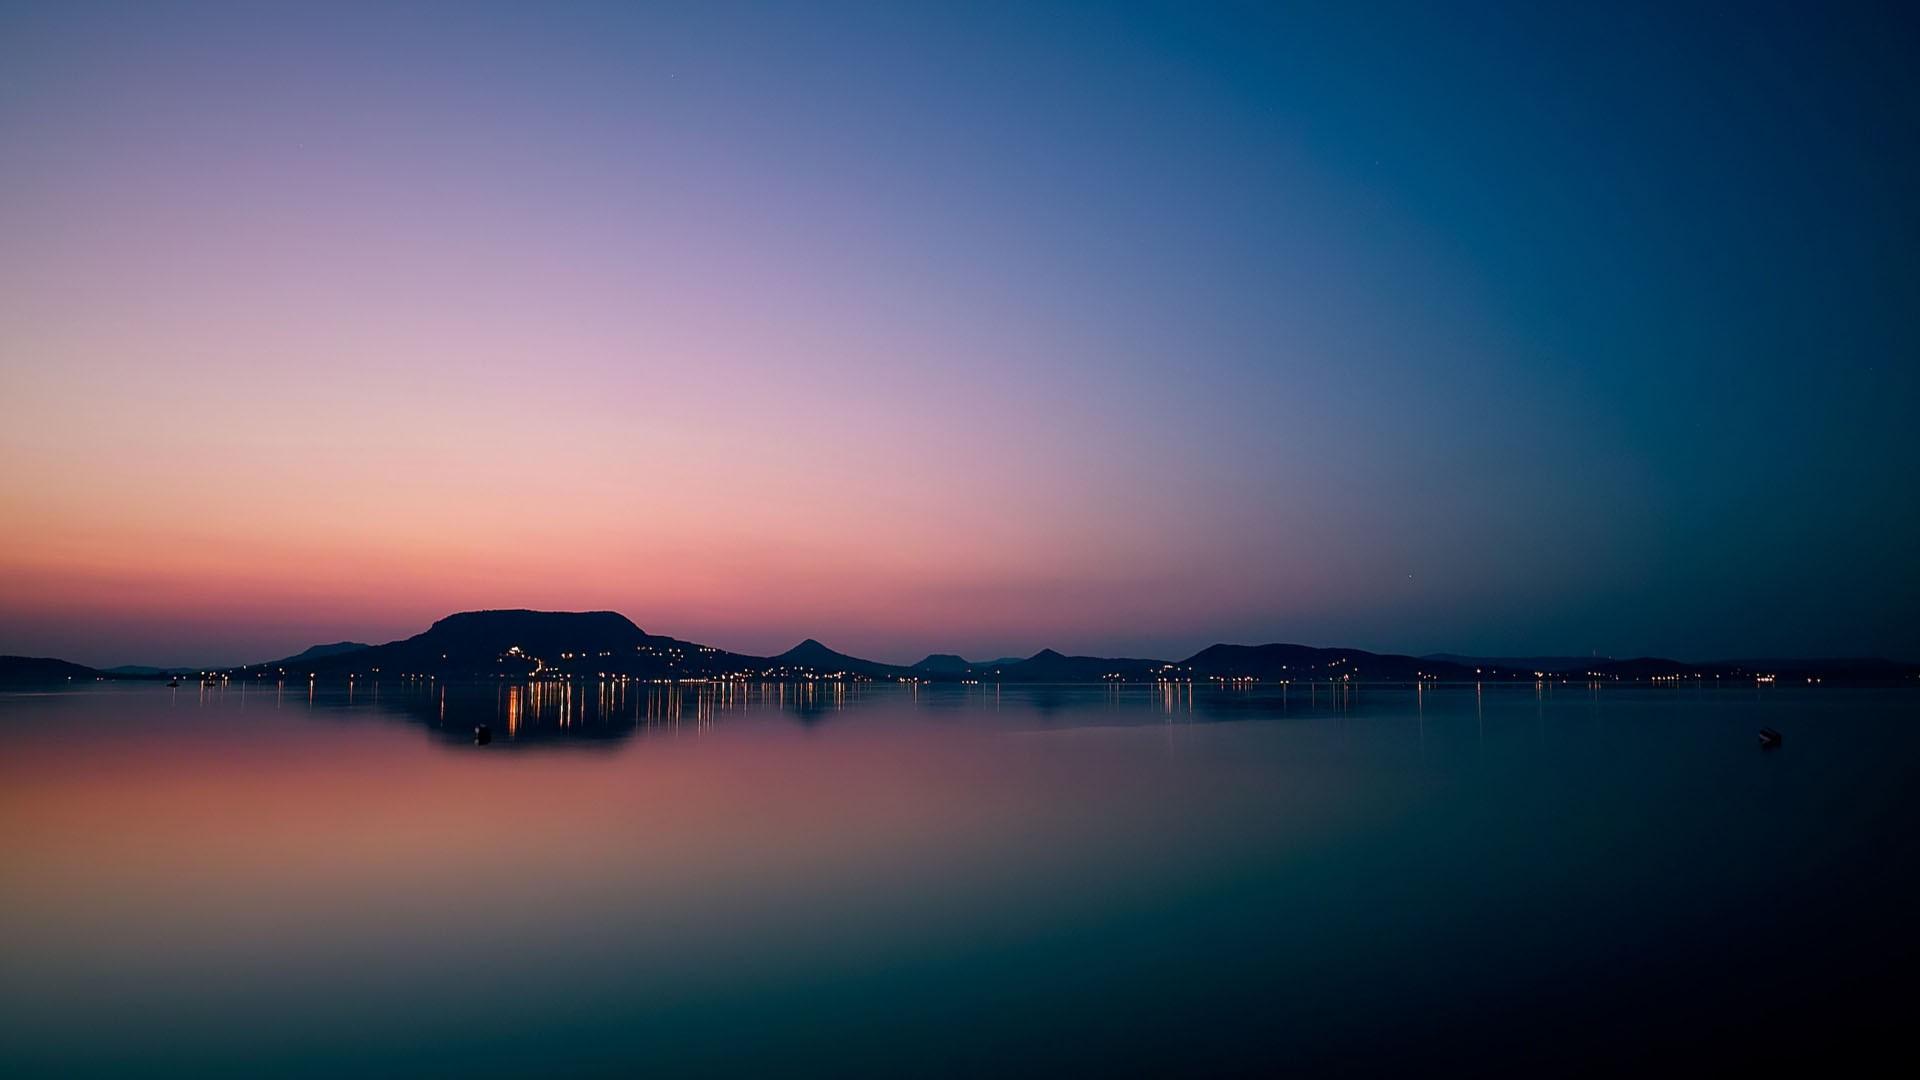 49+ Mac Wallpapers ·① Download Free Beautiful HD